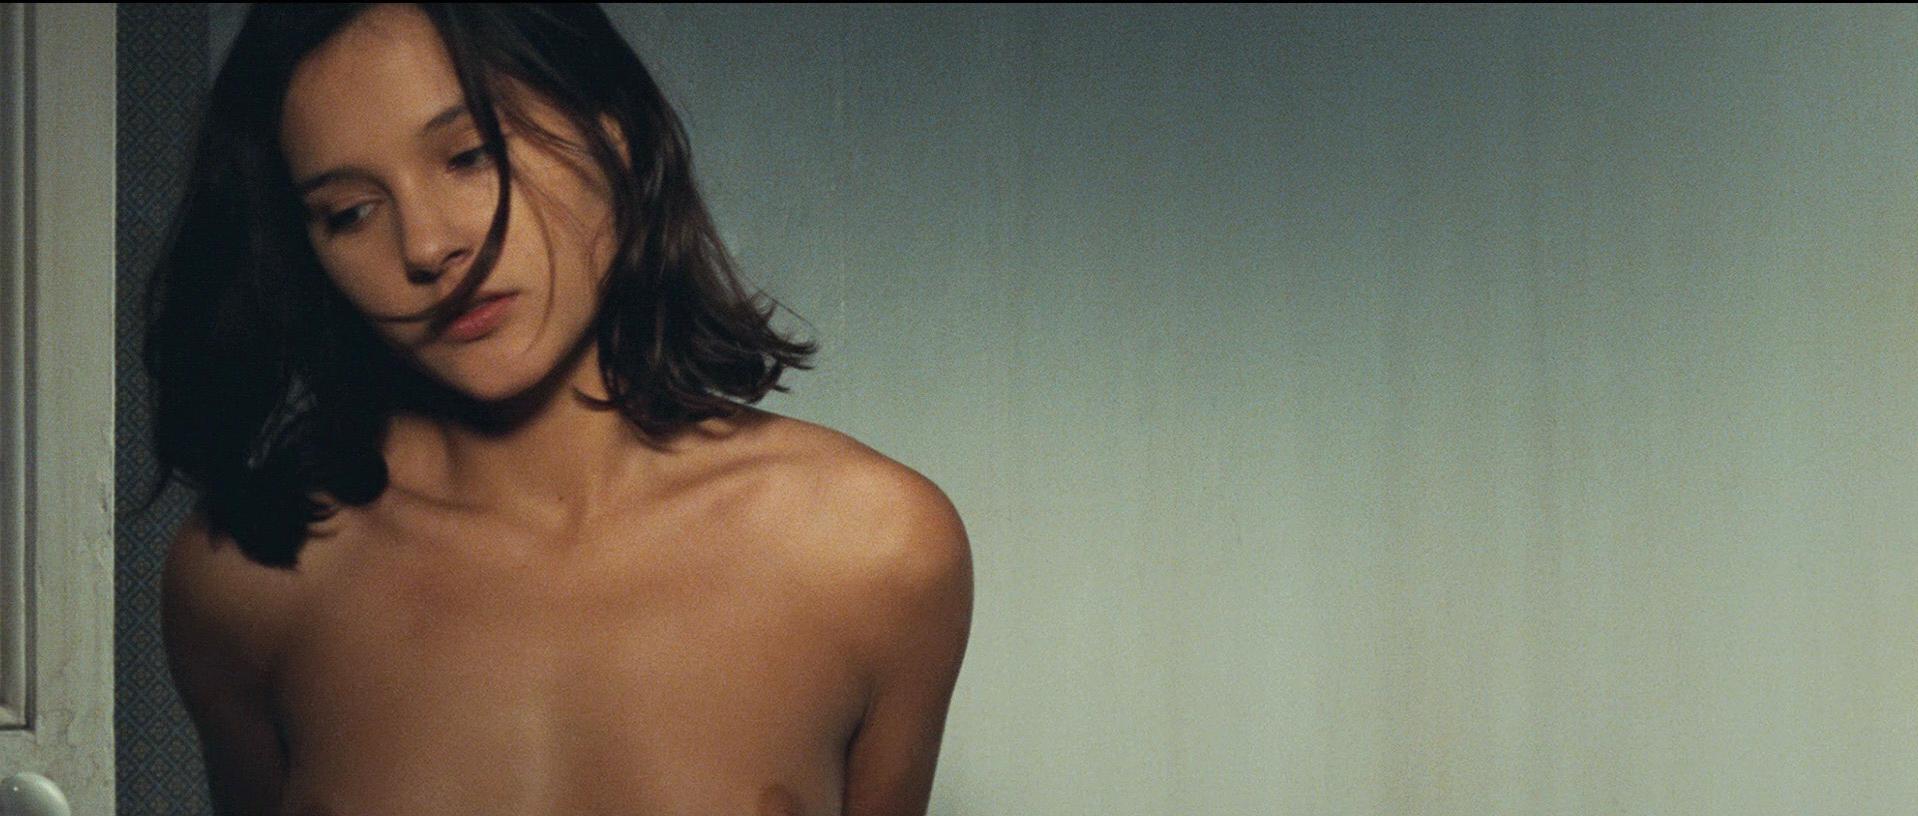 Nicole shvets topless